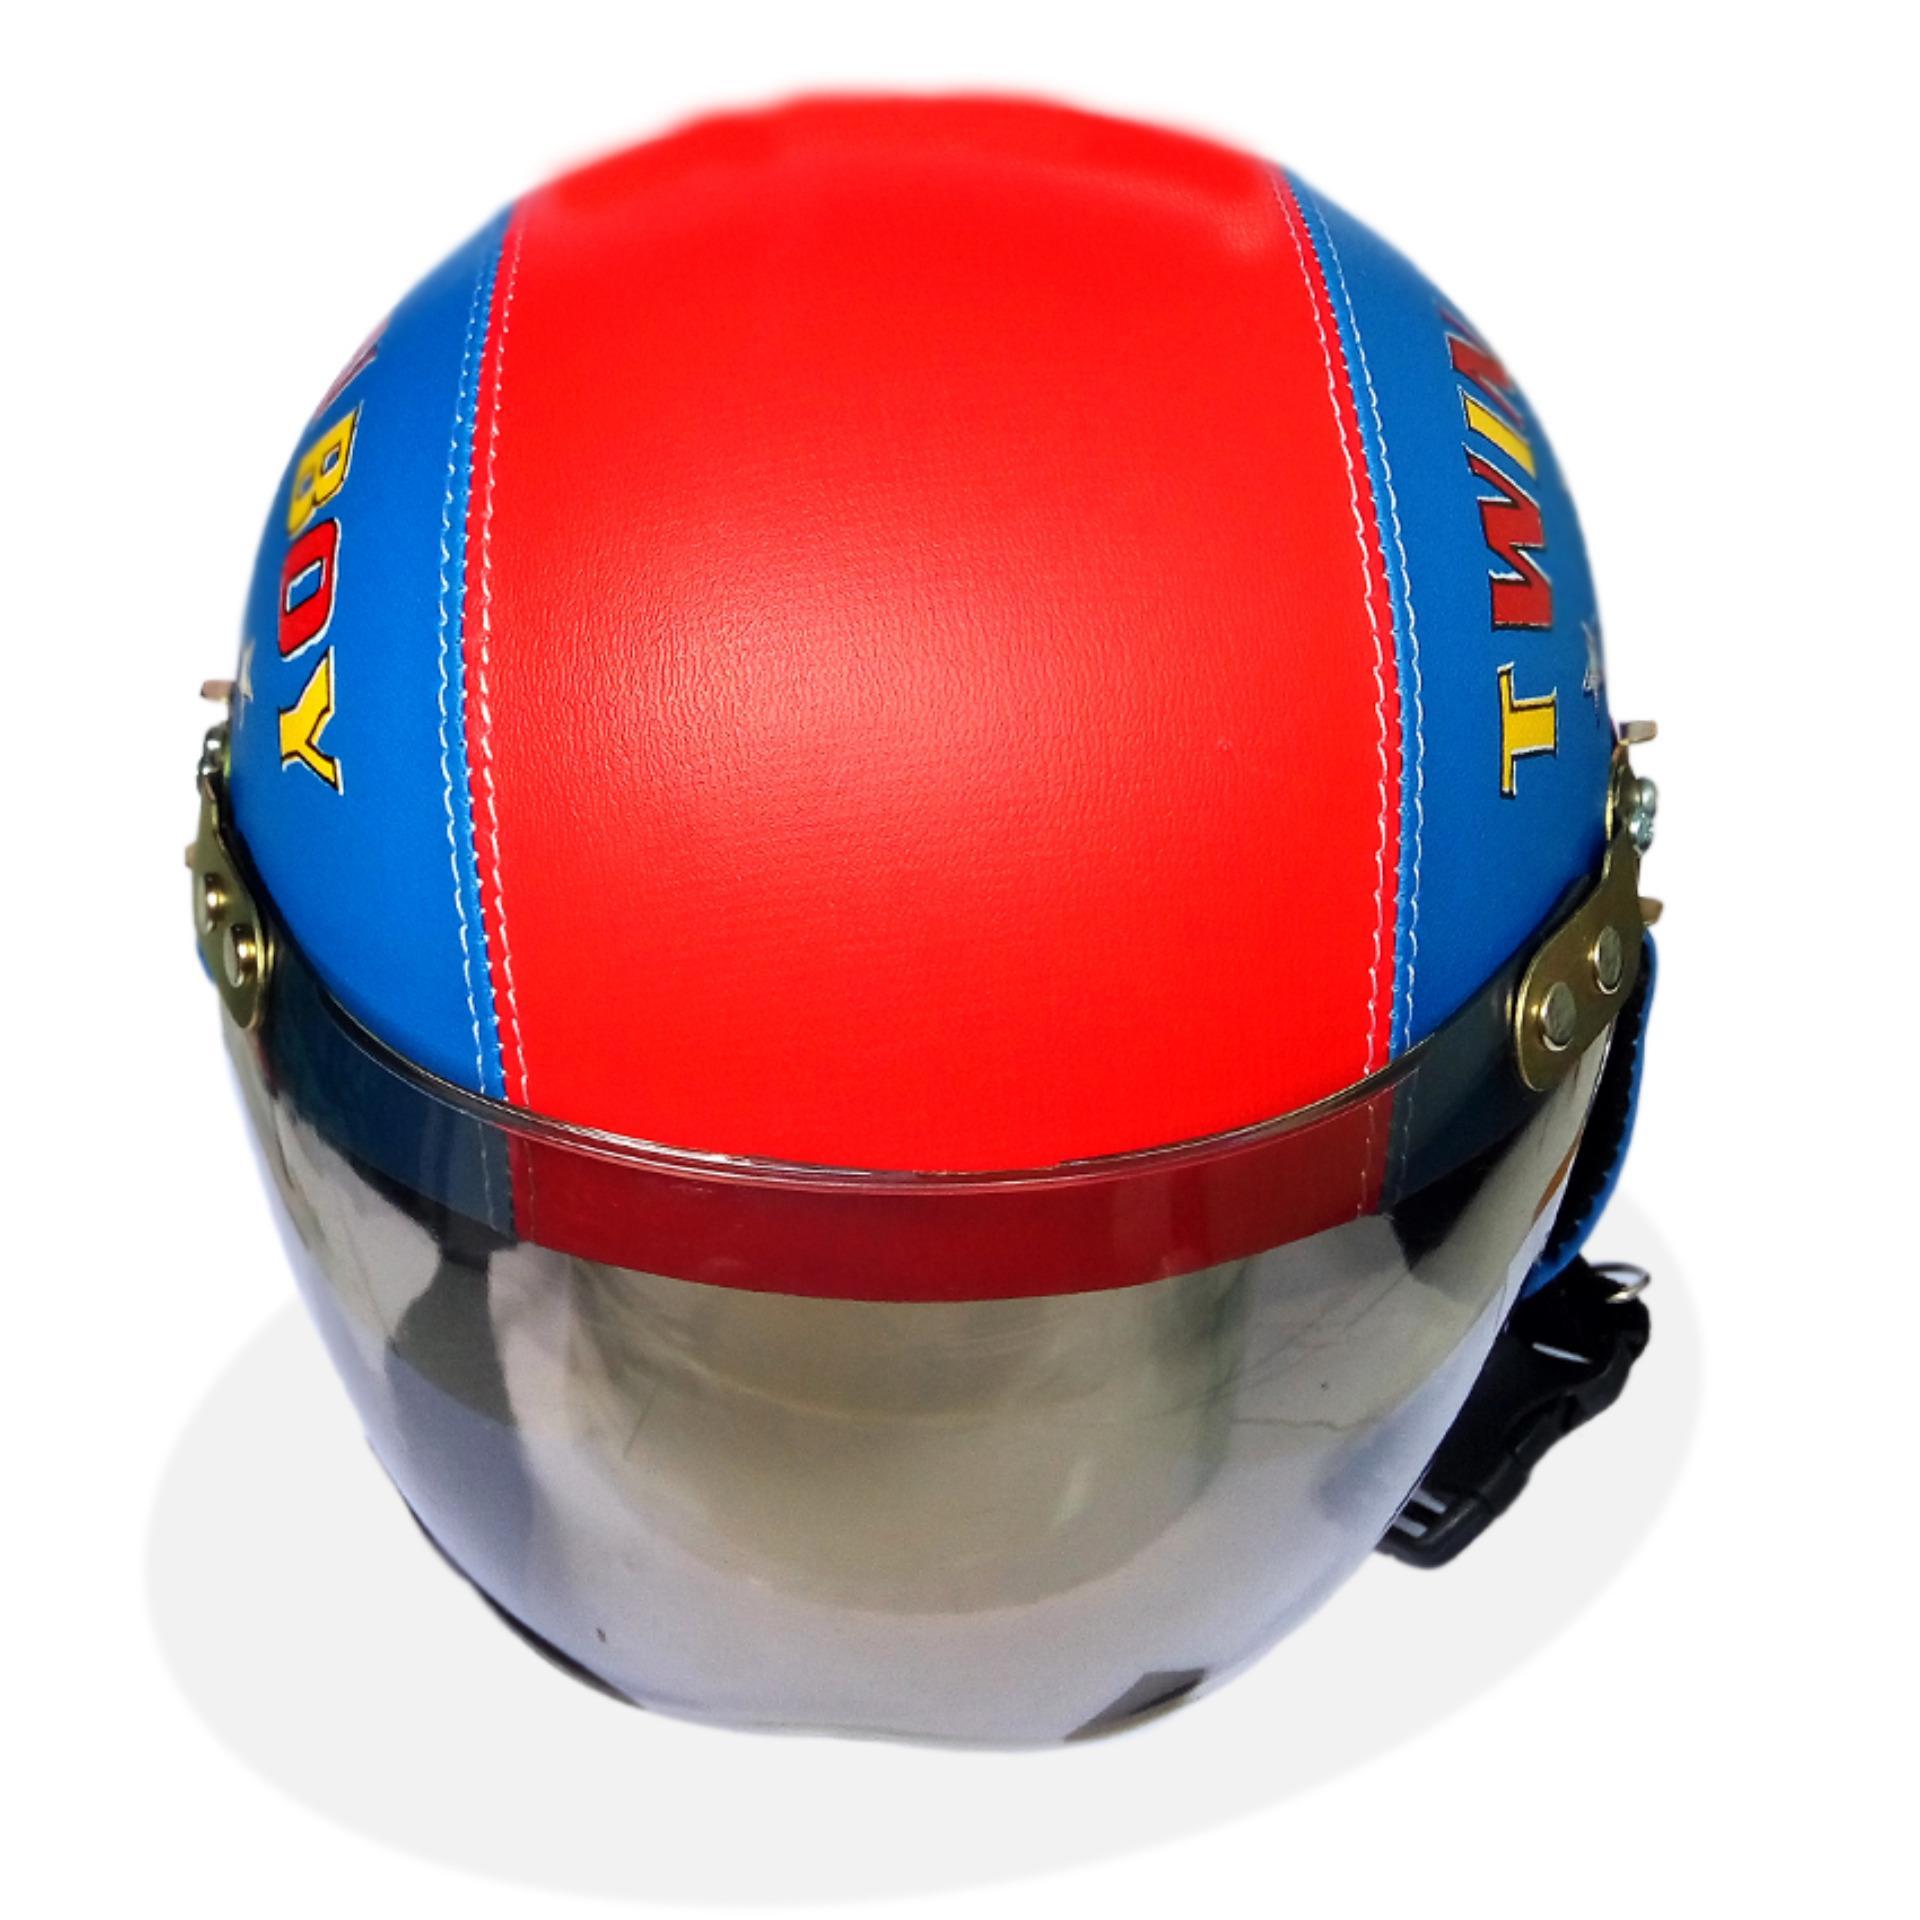 Helm Anak Unyu-unyu Model Retro Karakter Upin Ipin [1 -